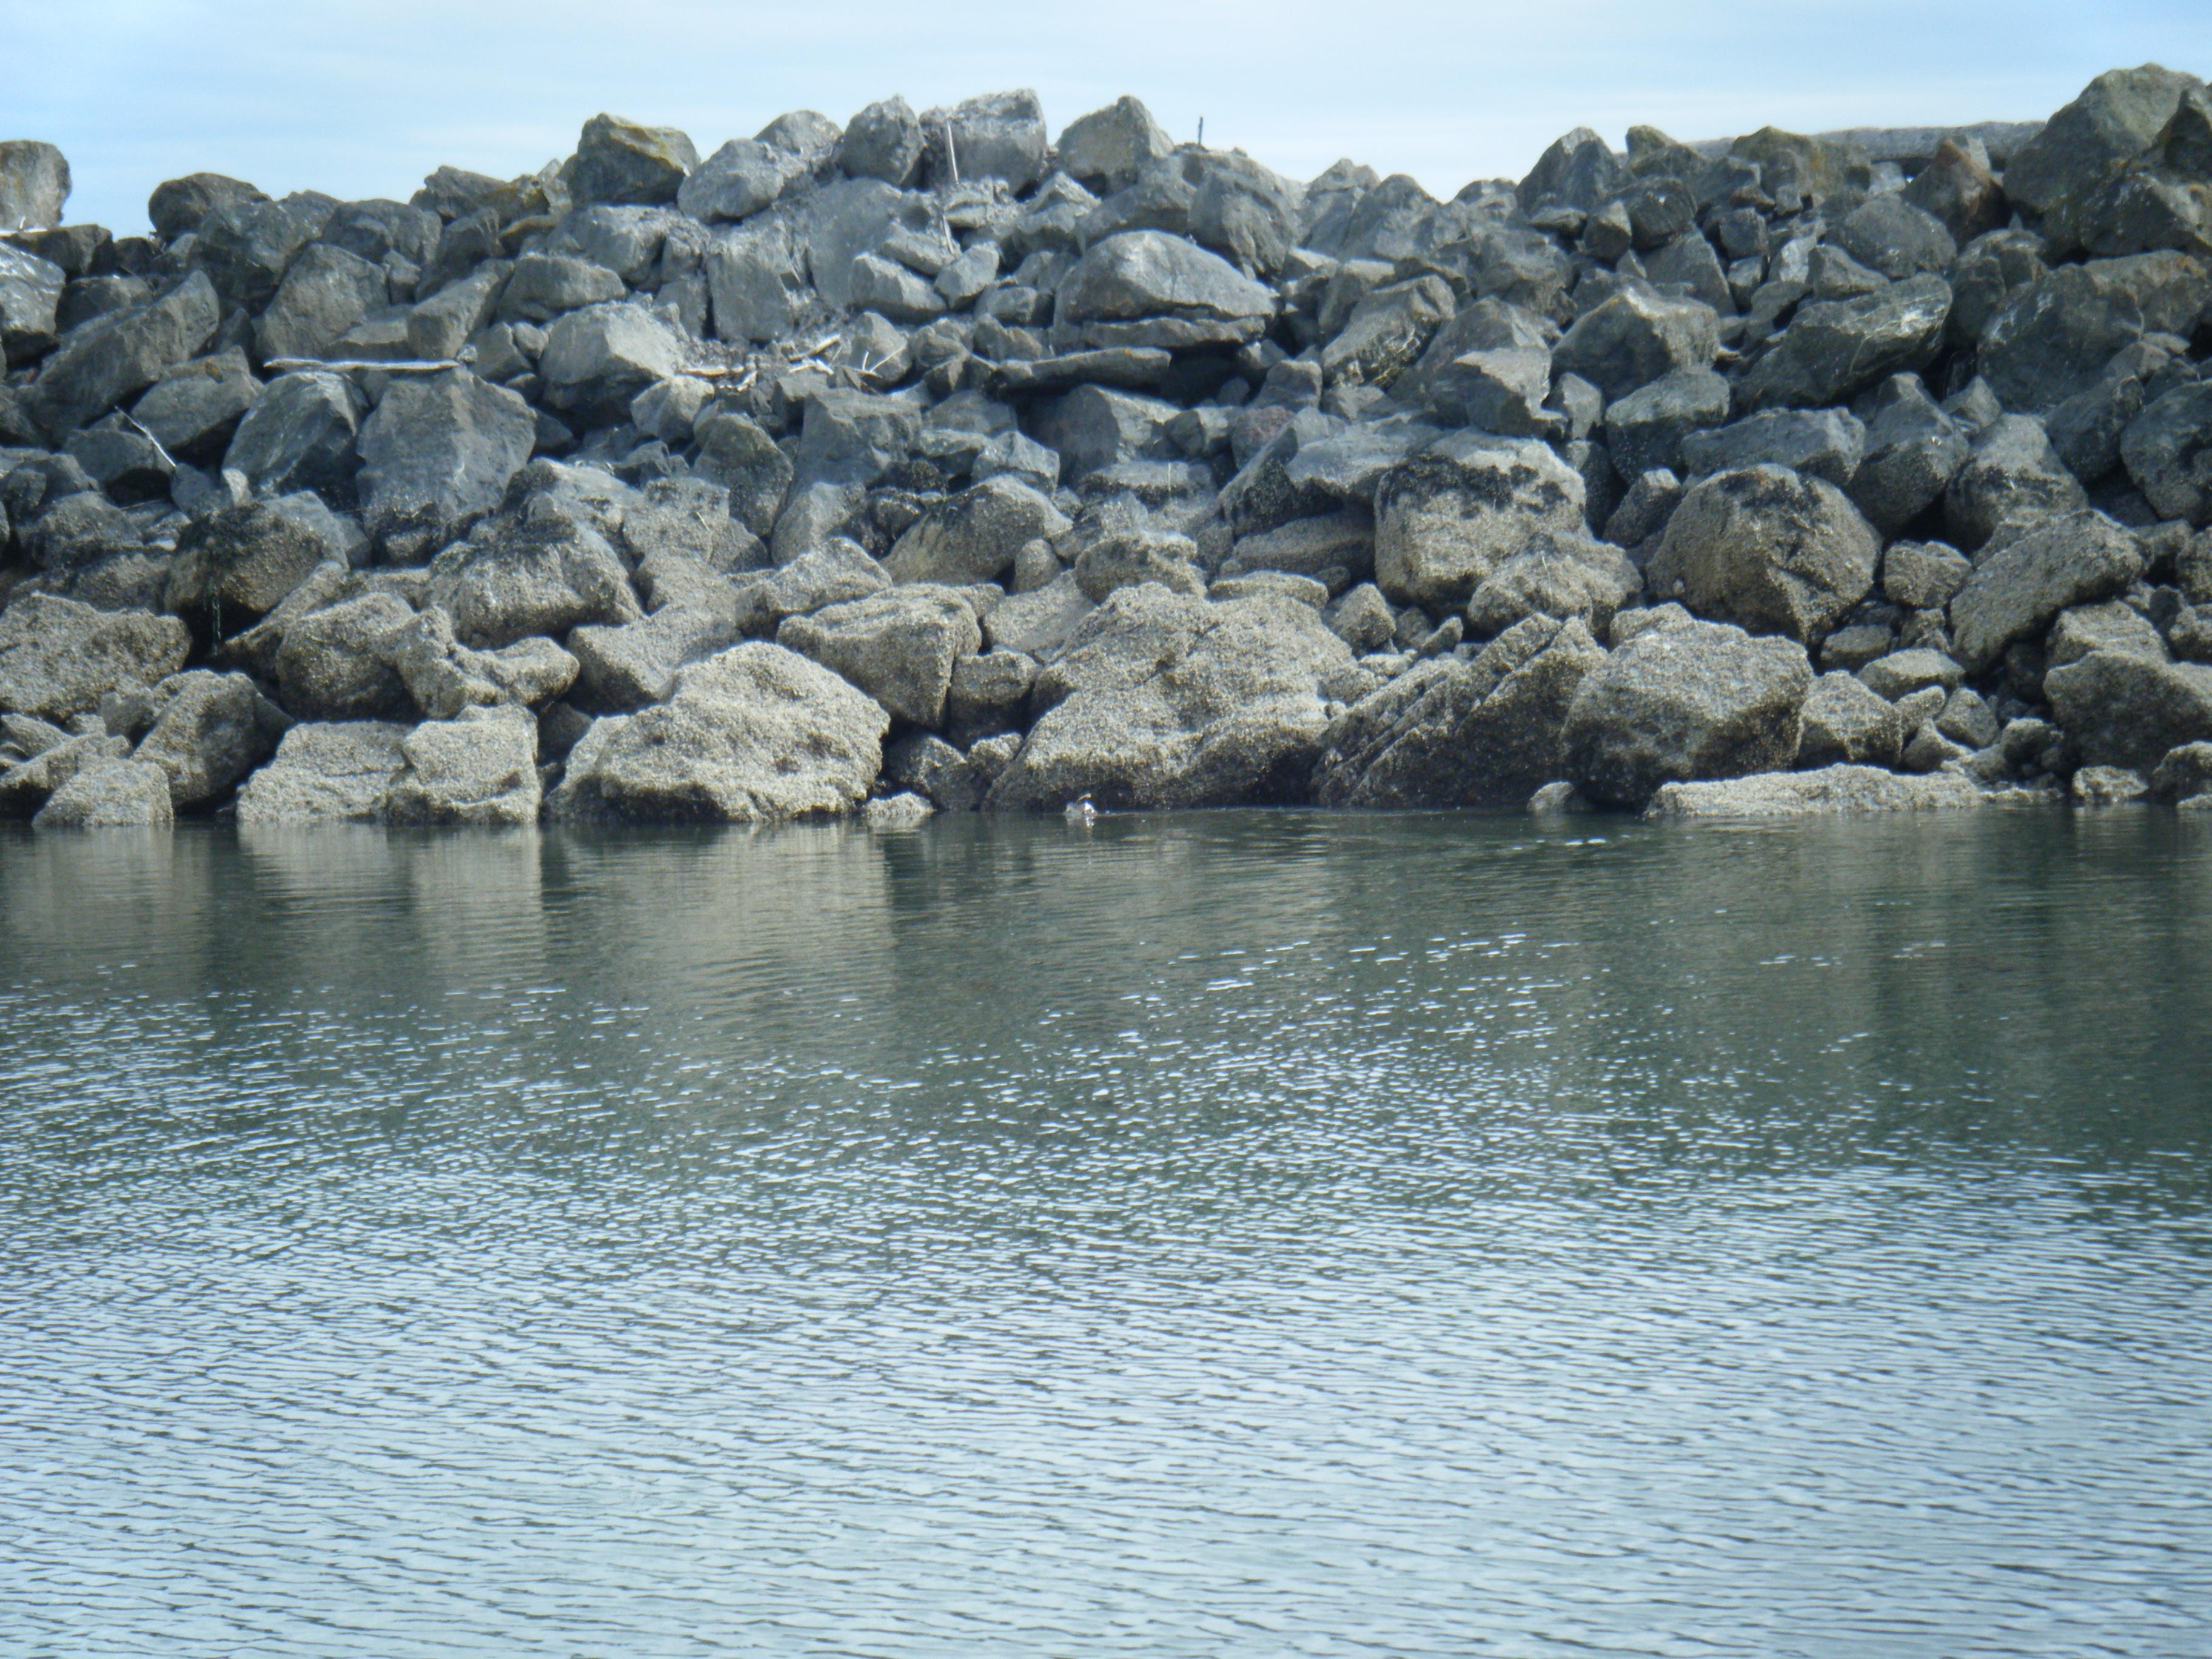 Sea Otter Captures Red Rock Crab